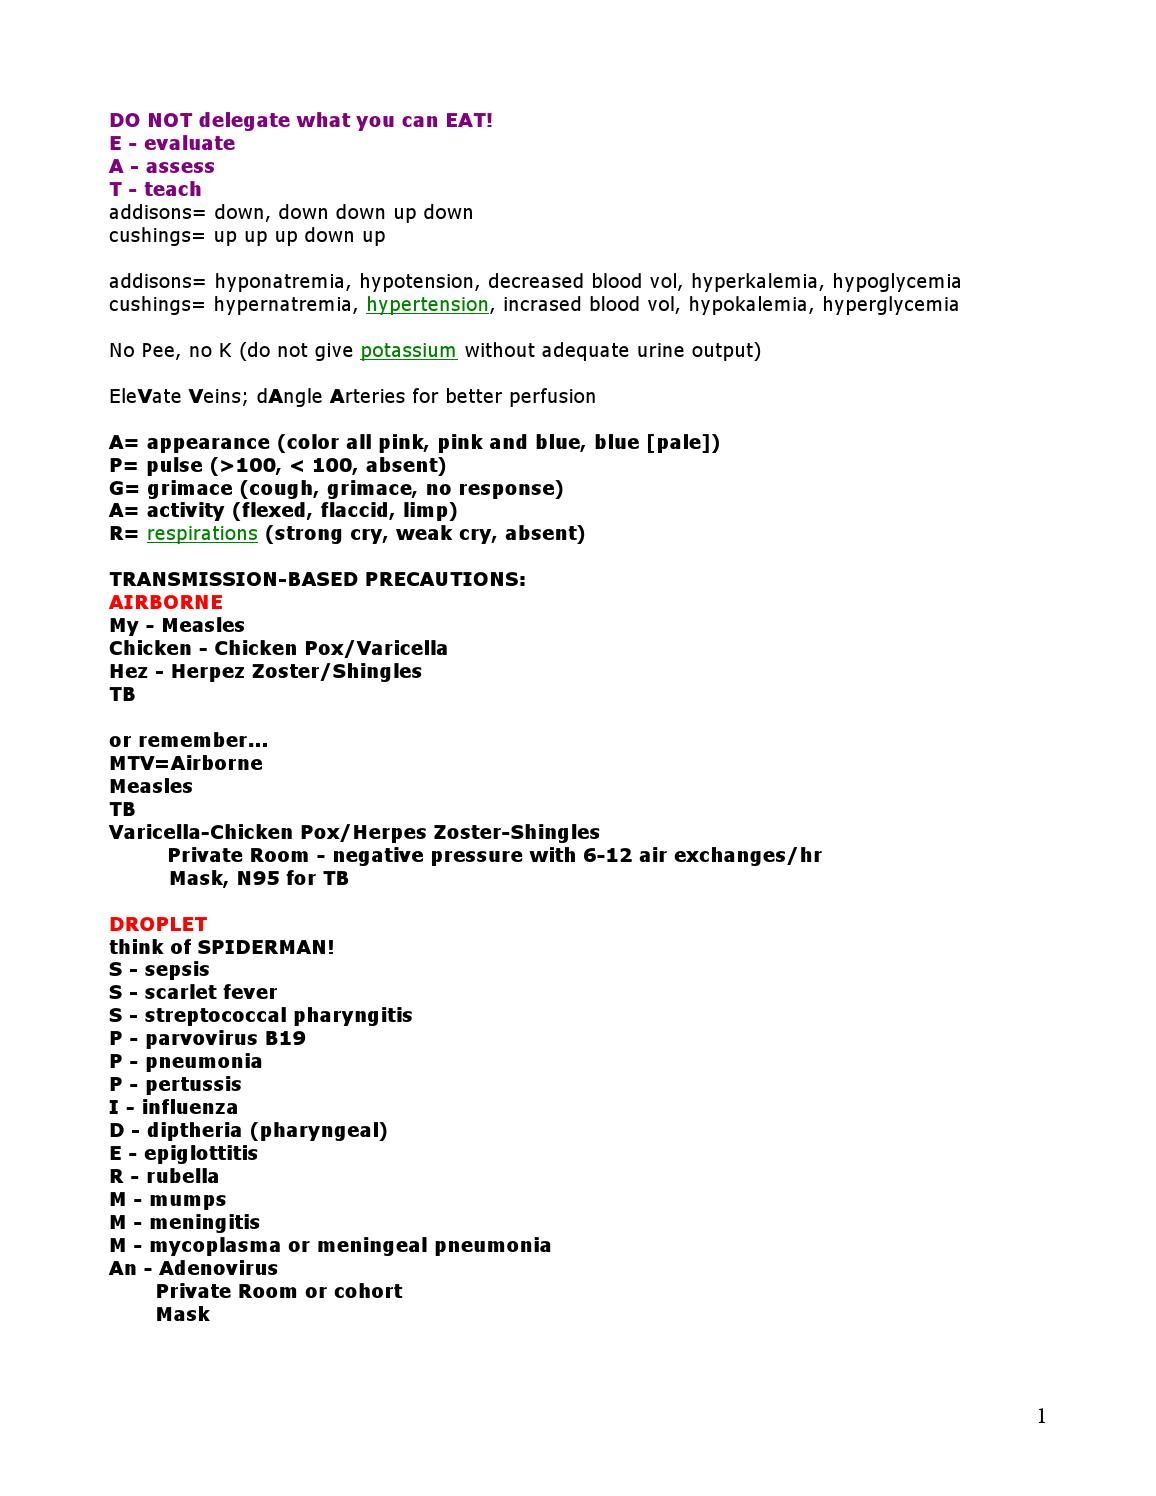 25855834 nclex study guide must read before test nclex rn rh pinterest com nclex study guide quizlet nclex study guide 2019